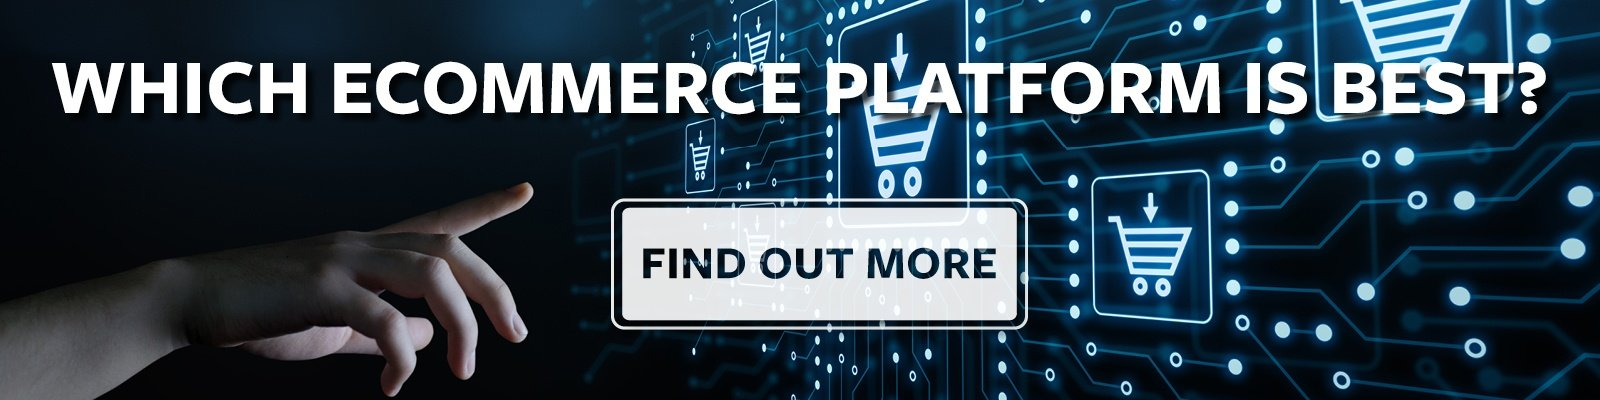 Which-Ecommerce-Platform-Is-Best